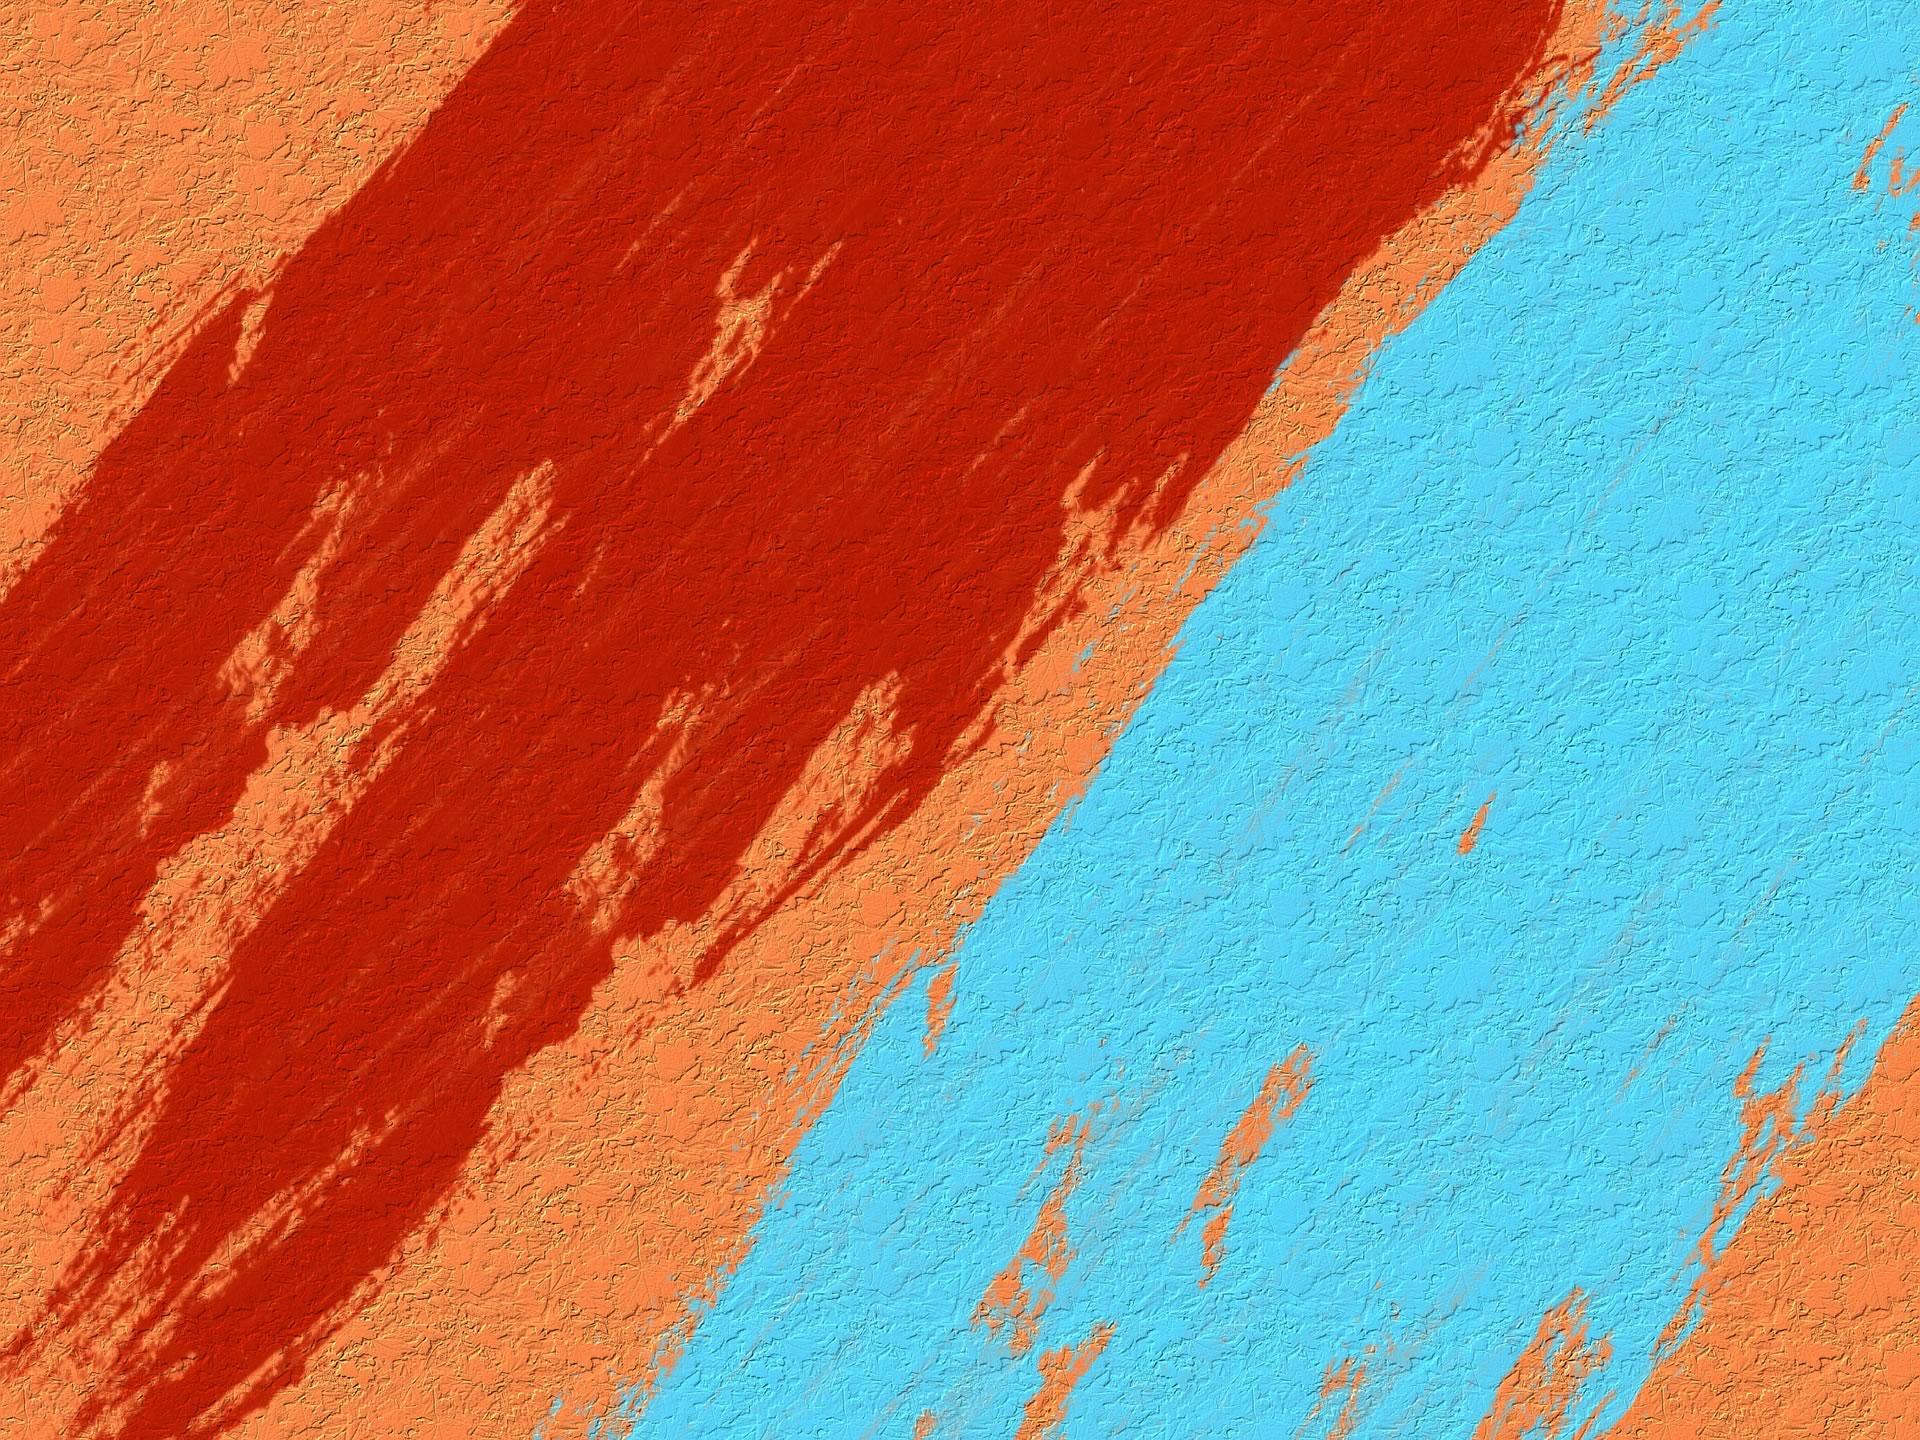 download wallpaper-abstract-9 wallpaper